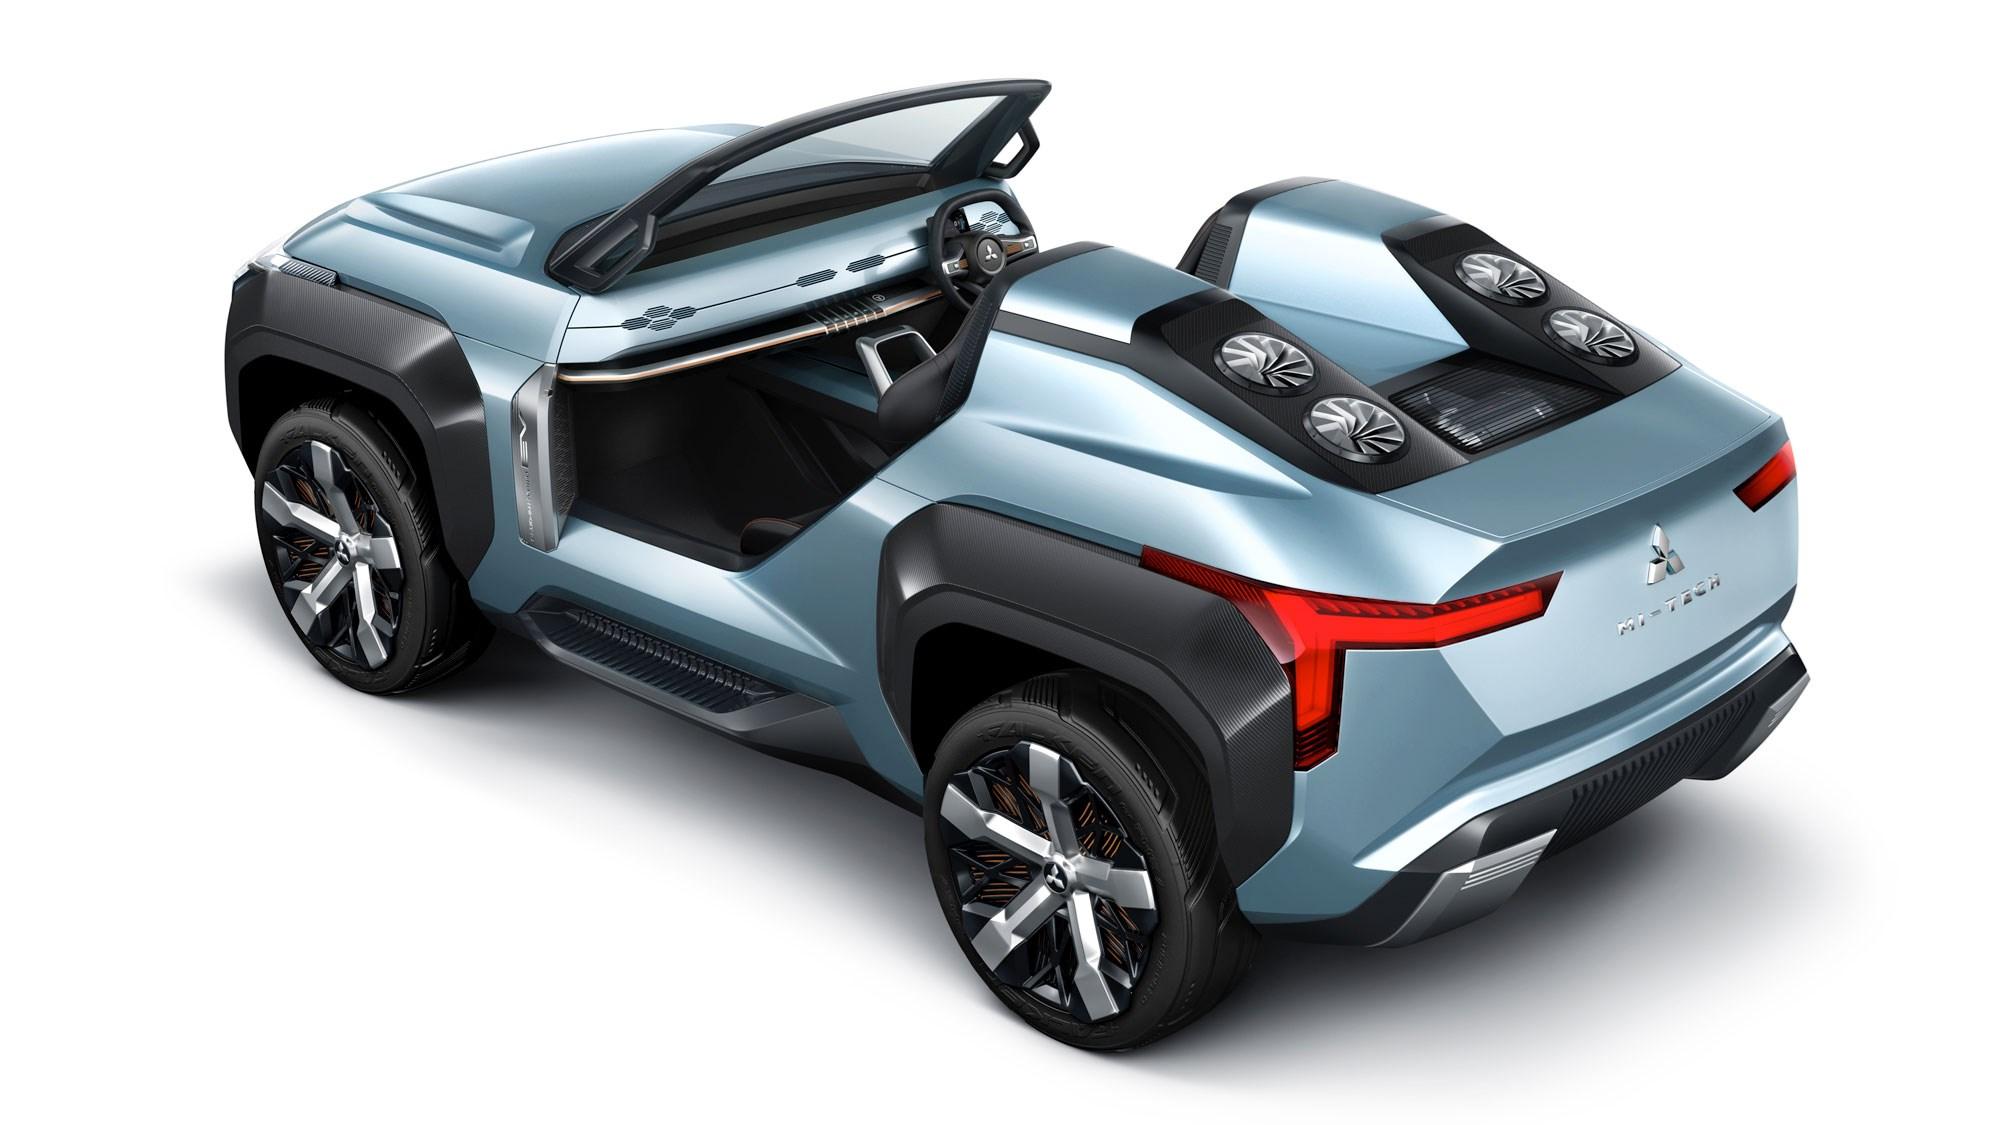 Mitsubishi Mi-Tech, K-Wagon: Specs, Features, Photos, 2019 Tokyo Motor Show